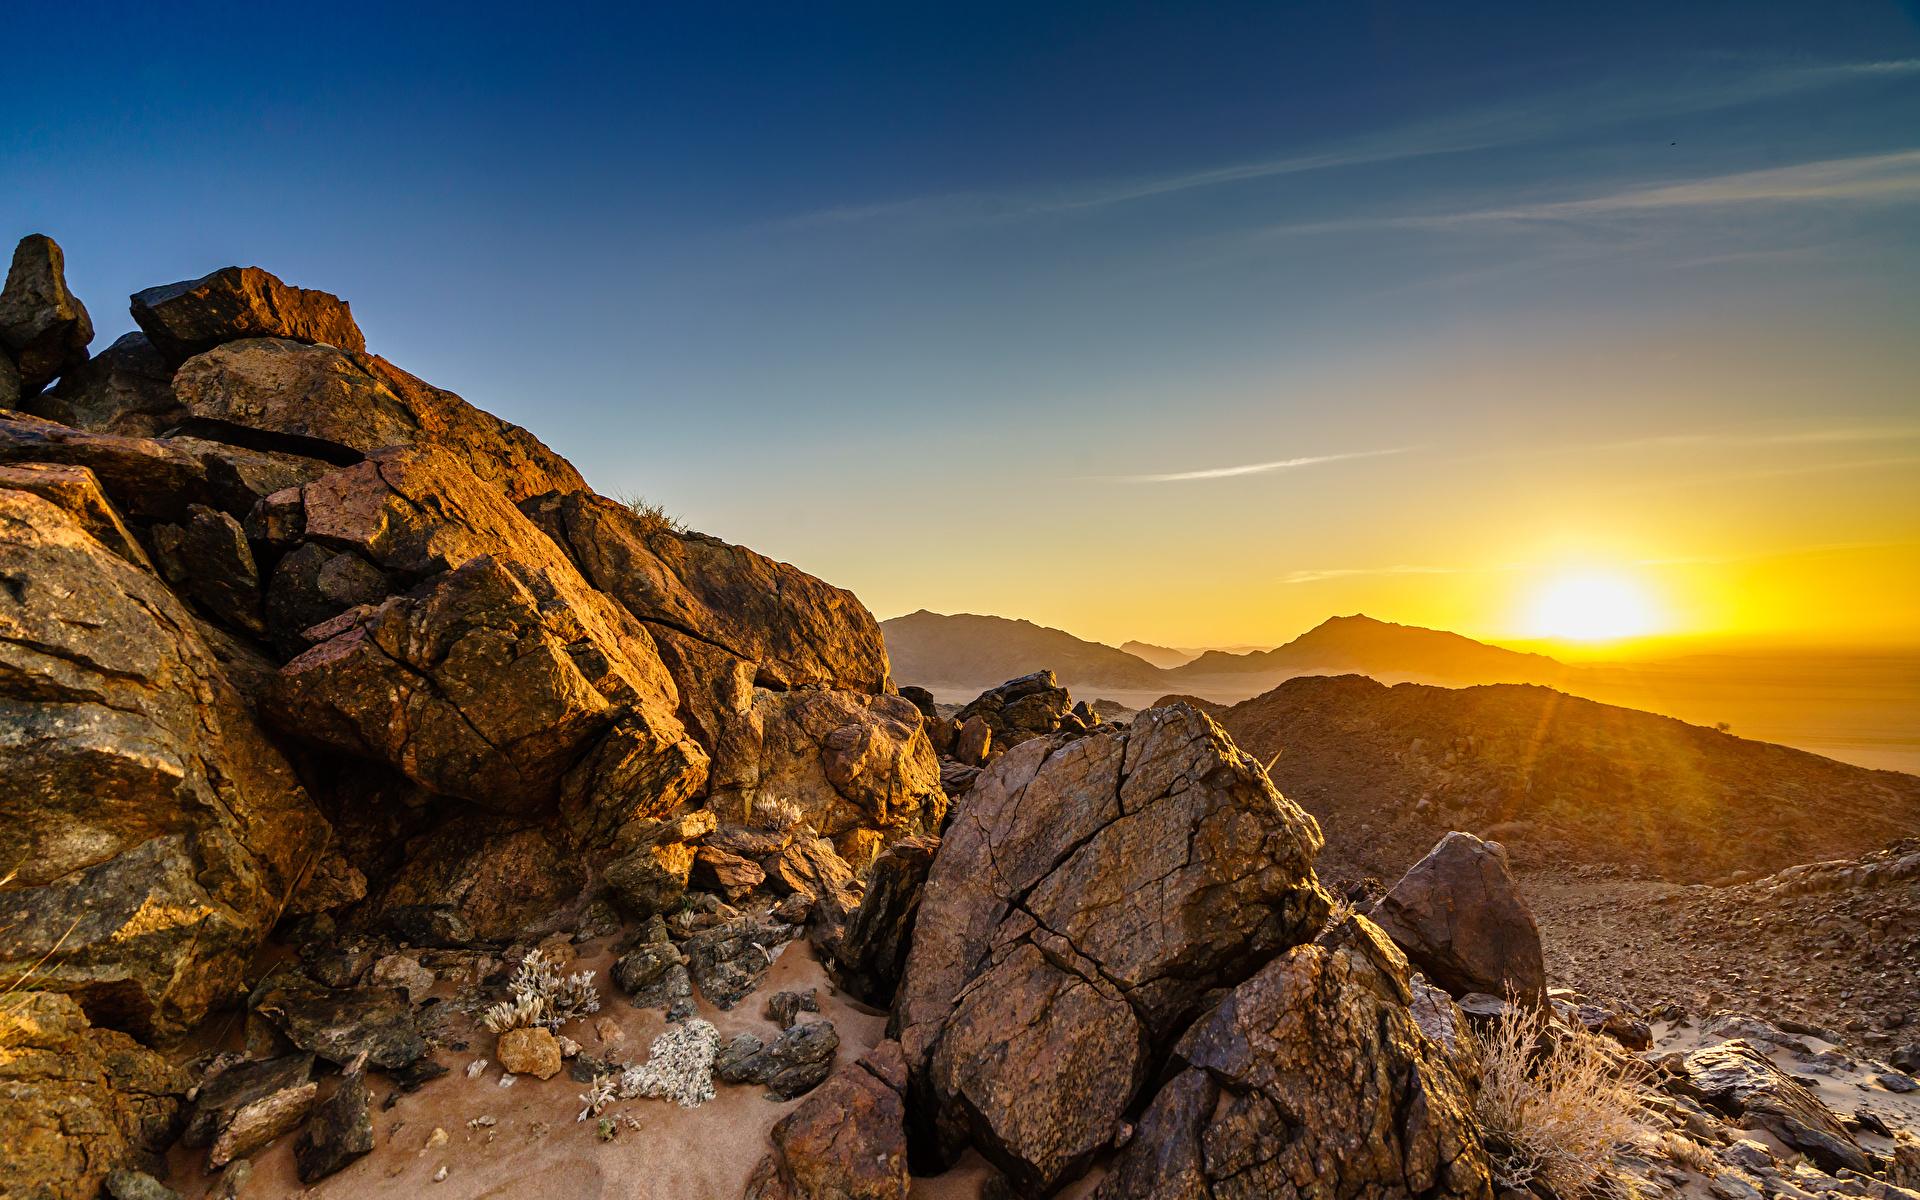 Картинки Африка Namib-Naukluft National Park, Namibia скале Природа рассвет и закат Камни 1920x1200 Утес Скала скалы Рассветы и закаты Камень